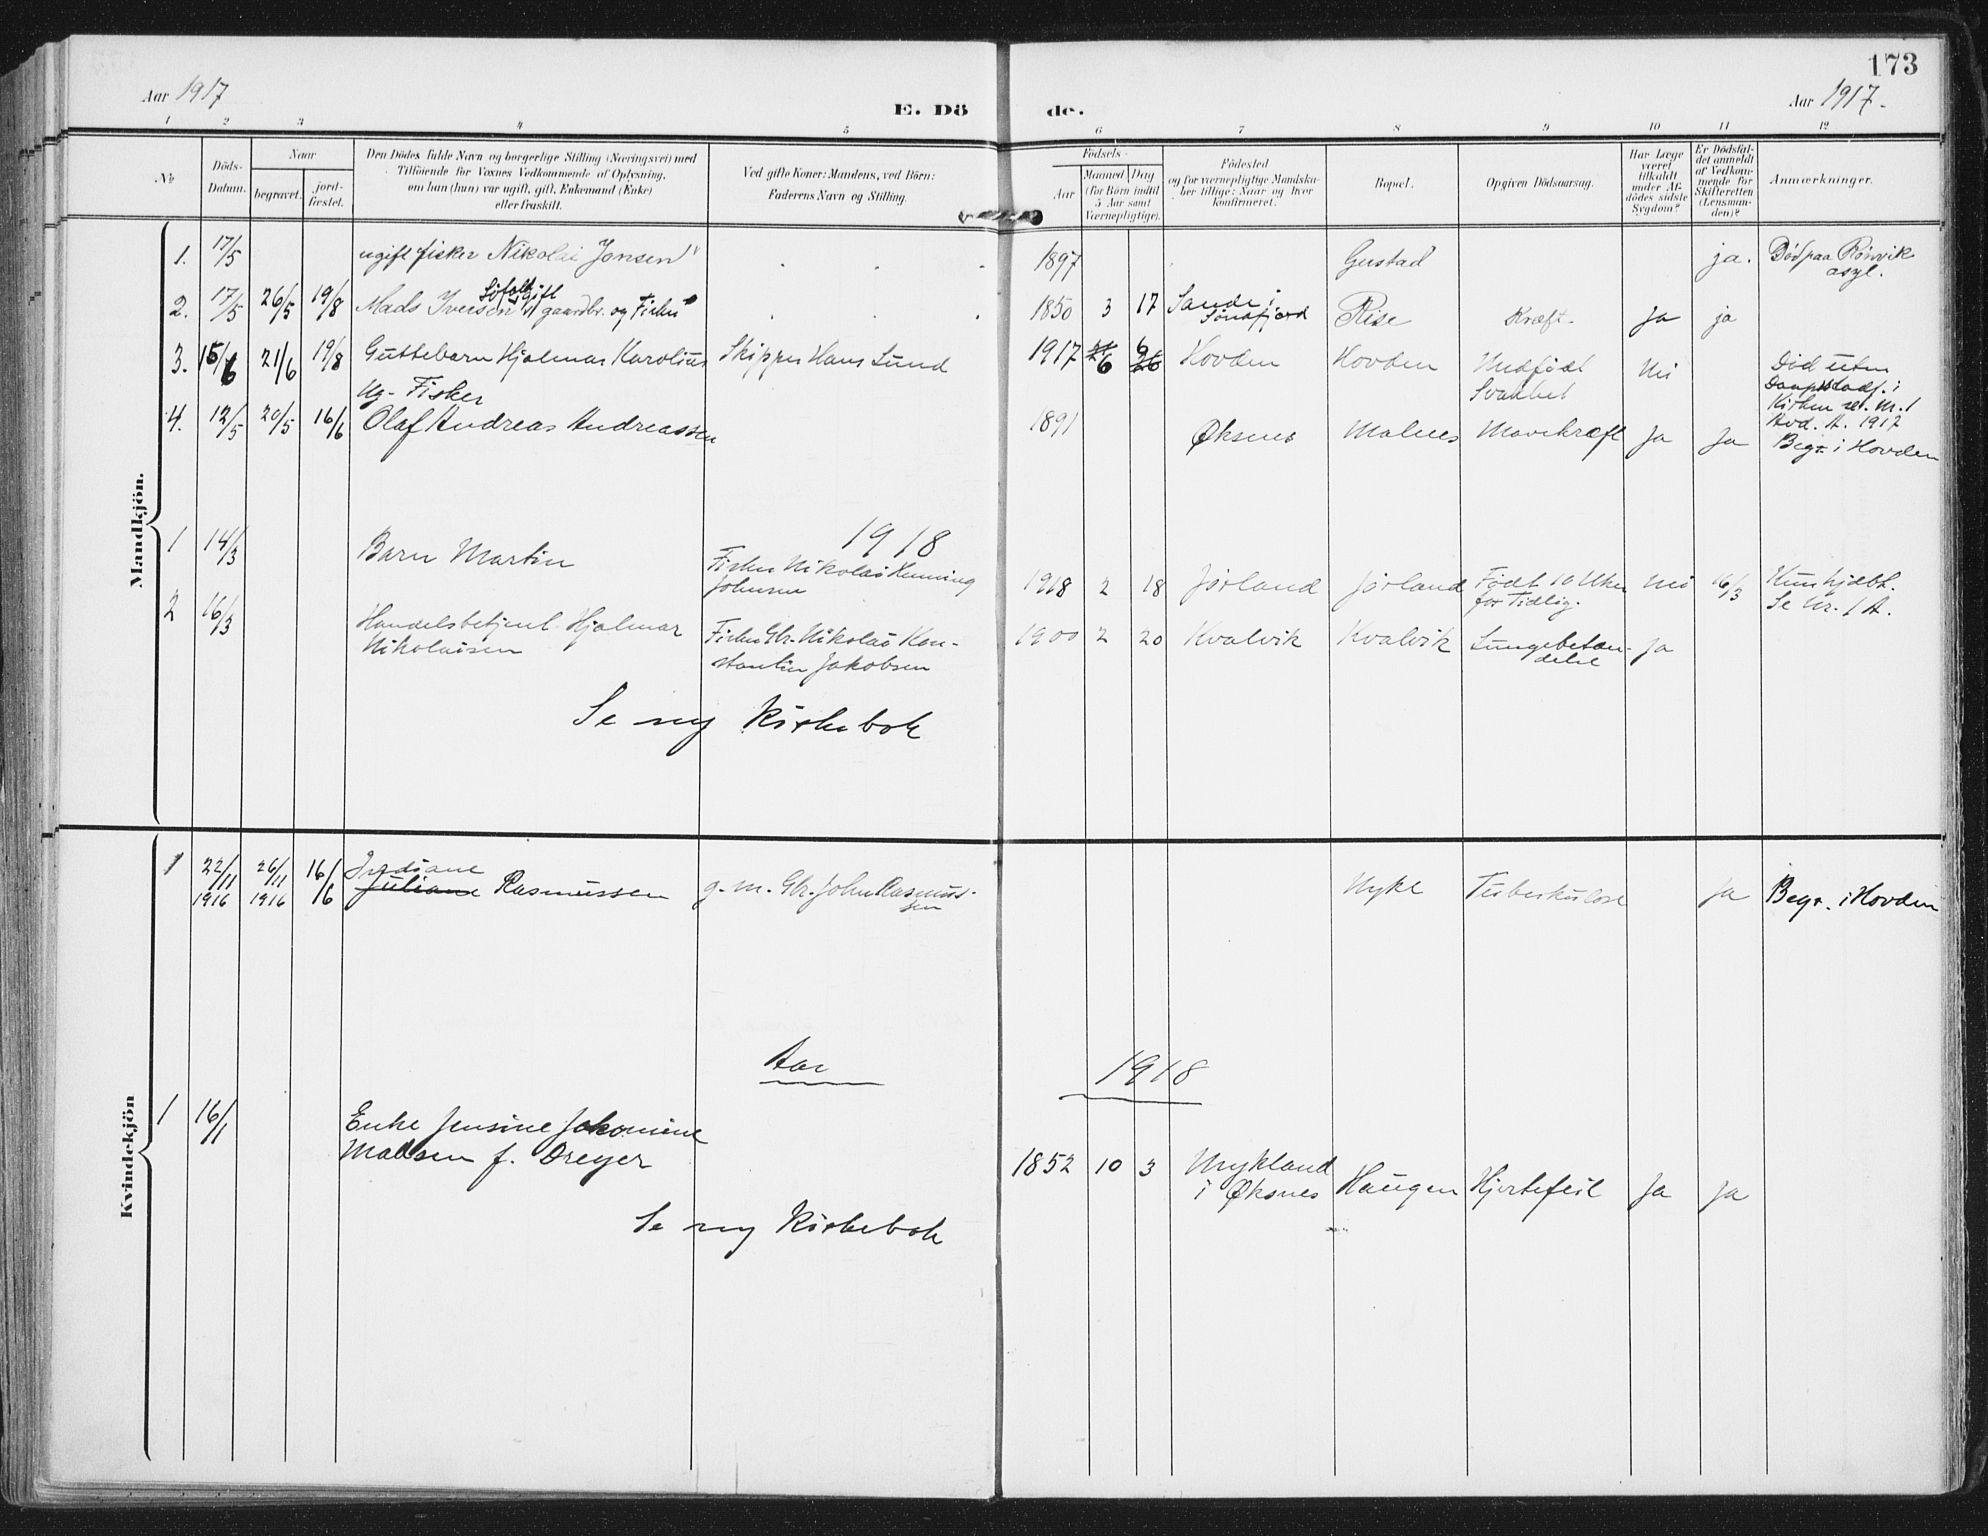 SAT, Ministerialprotokoller, klokkerbøker og fødselsregistre - Nordland, 892/L1321: Ministerialbok nr. 892A02, 1902-1918, s. 173